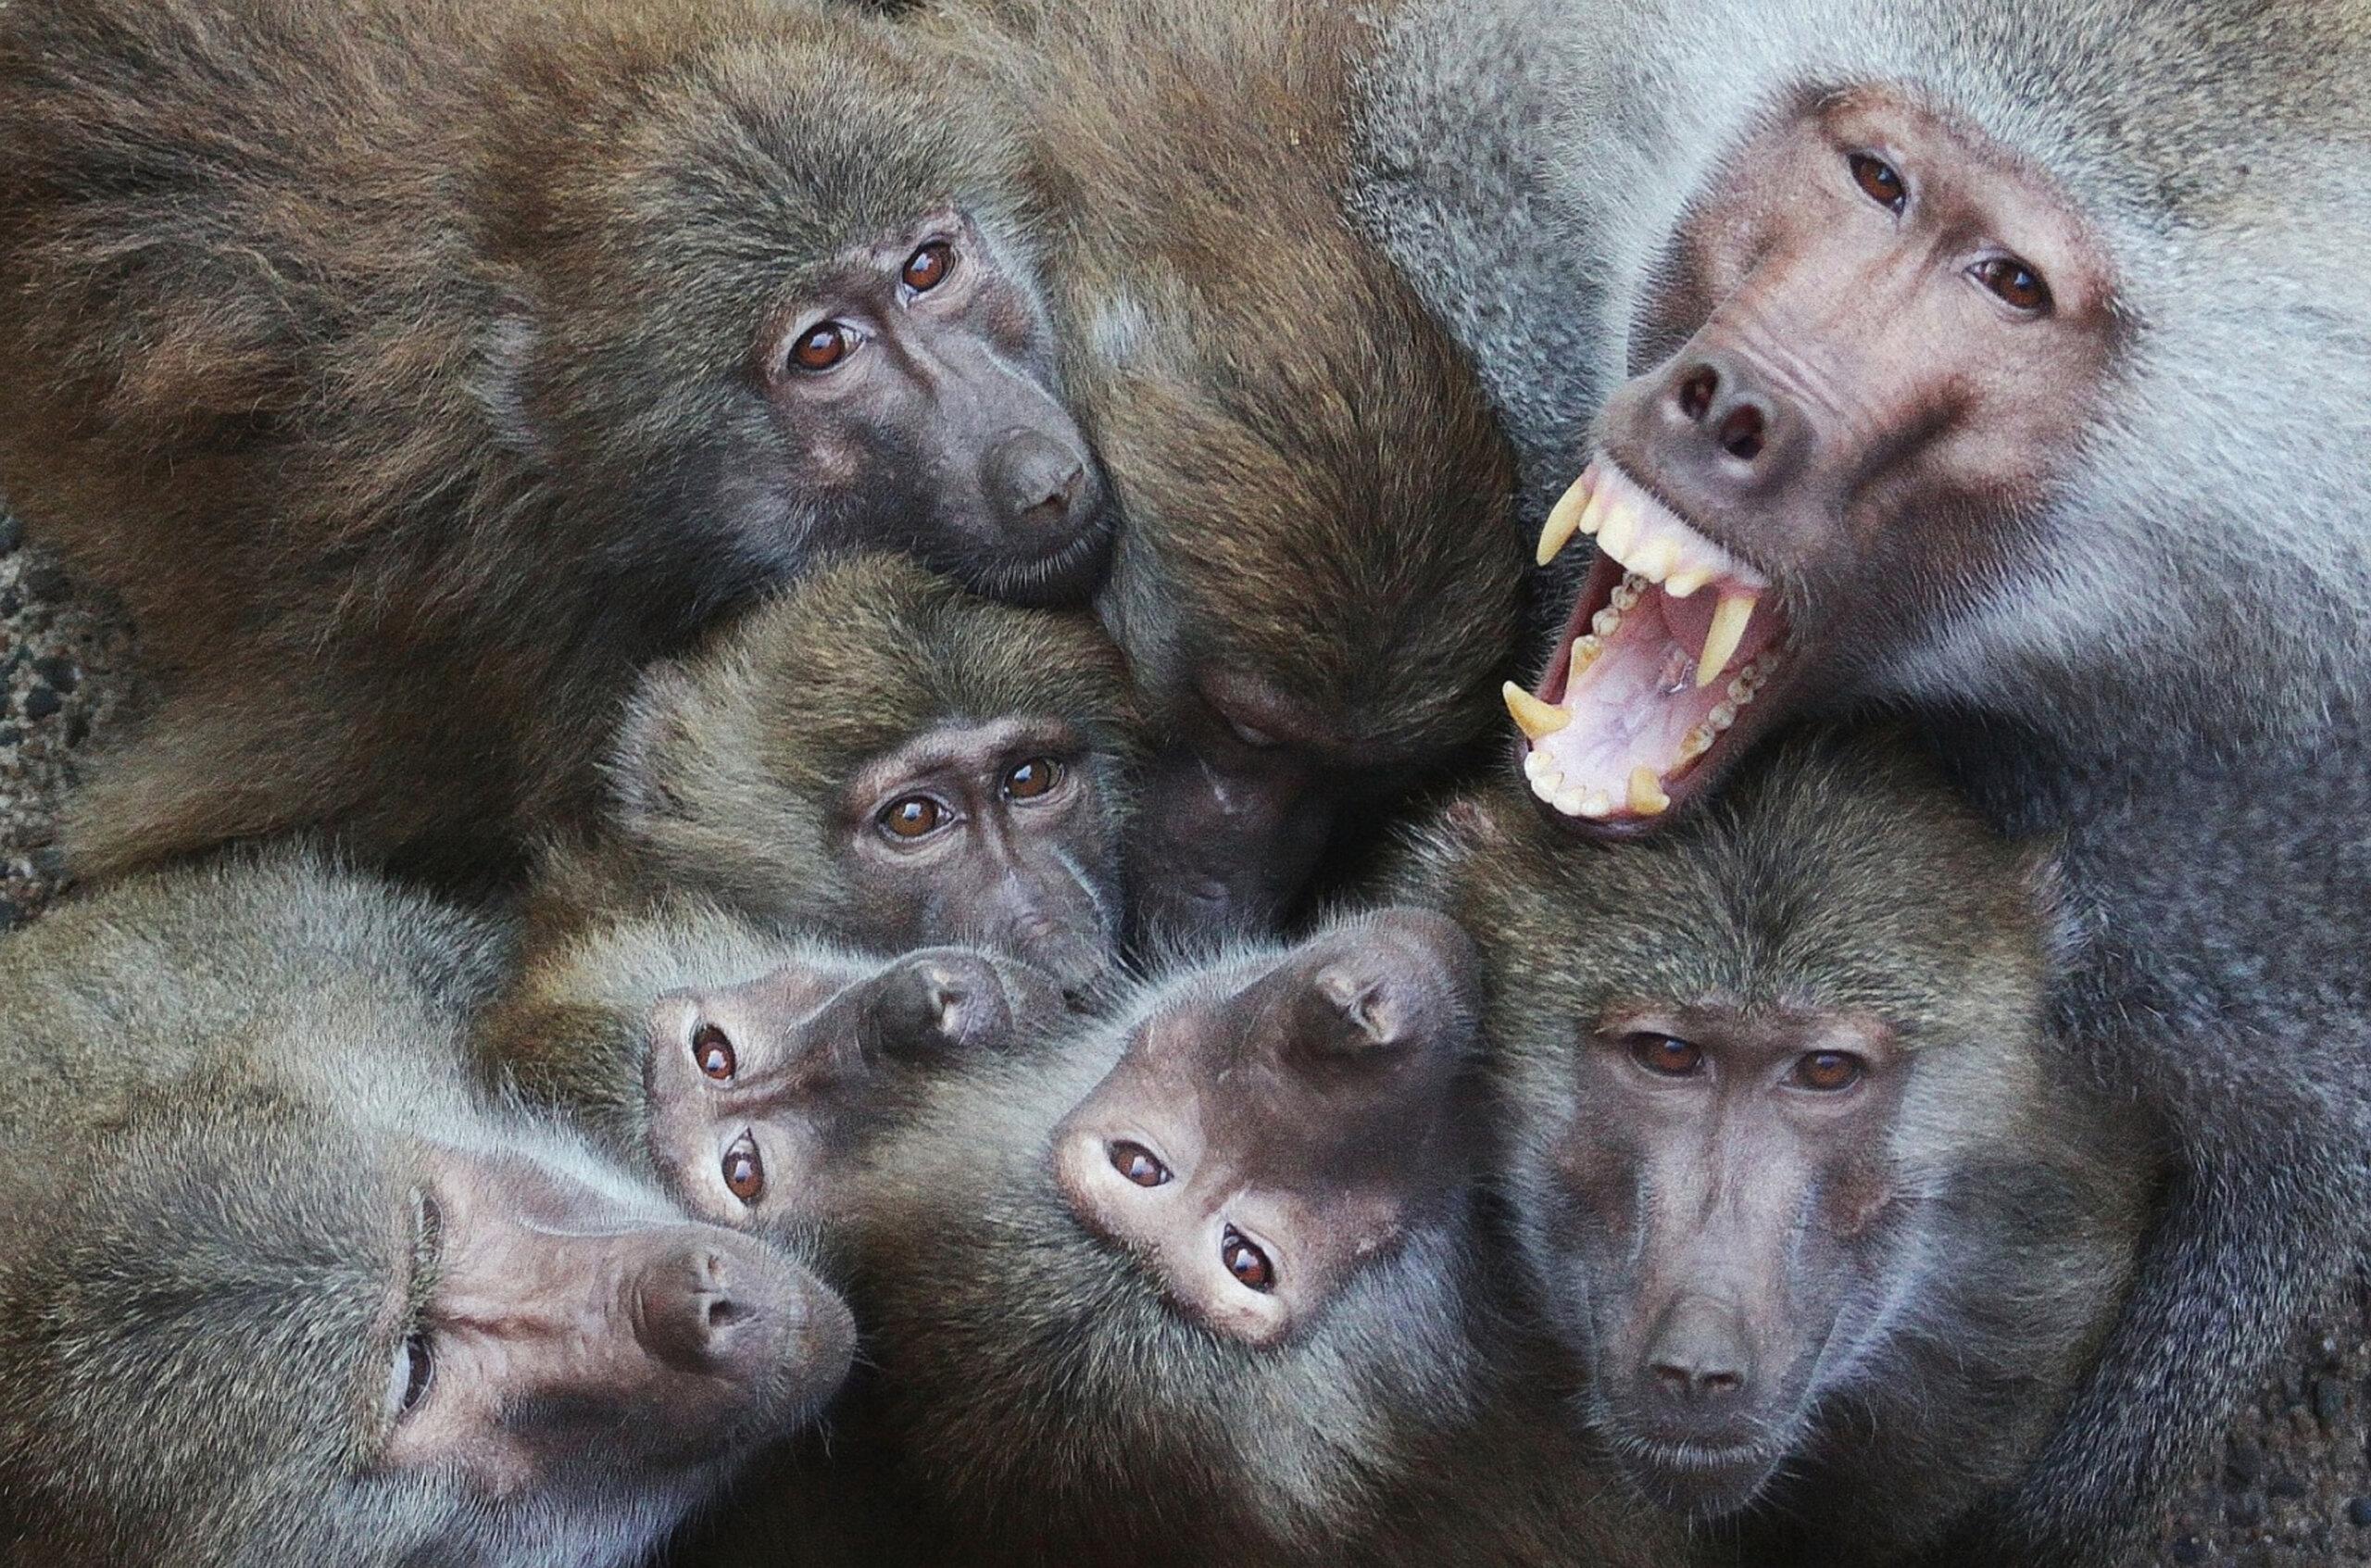 Neunkircher Zoo hält 72 Paviane in winzigem Gehege gefangen